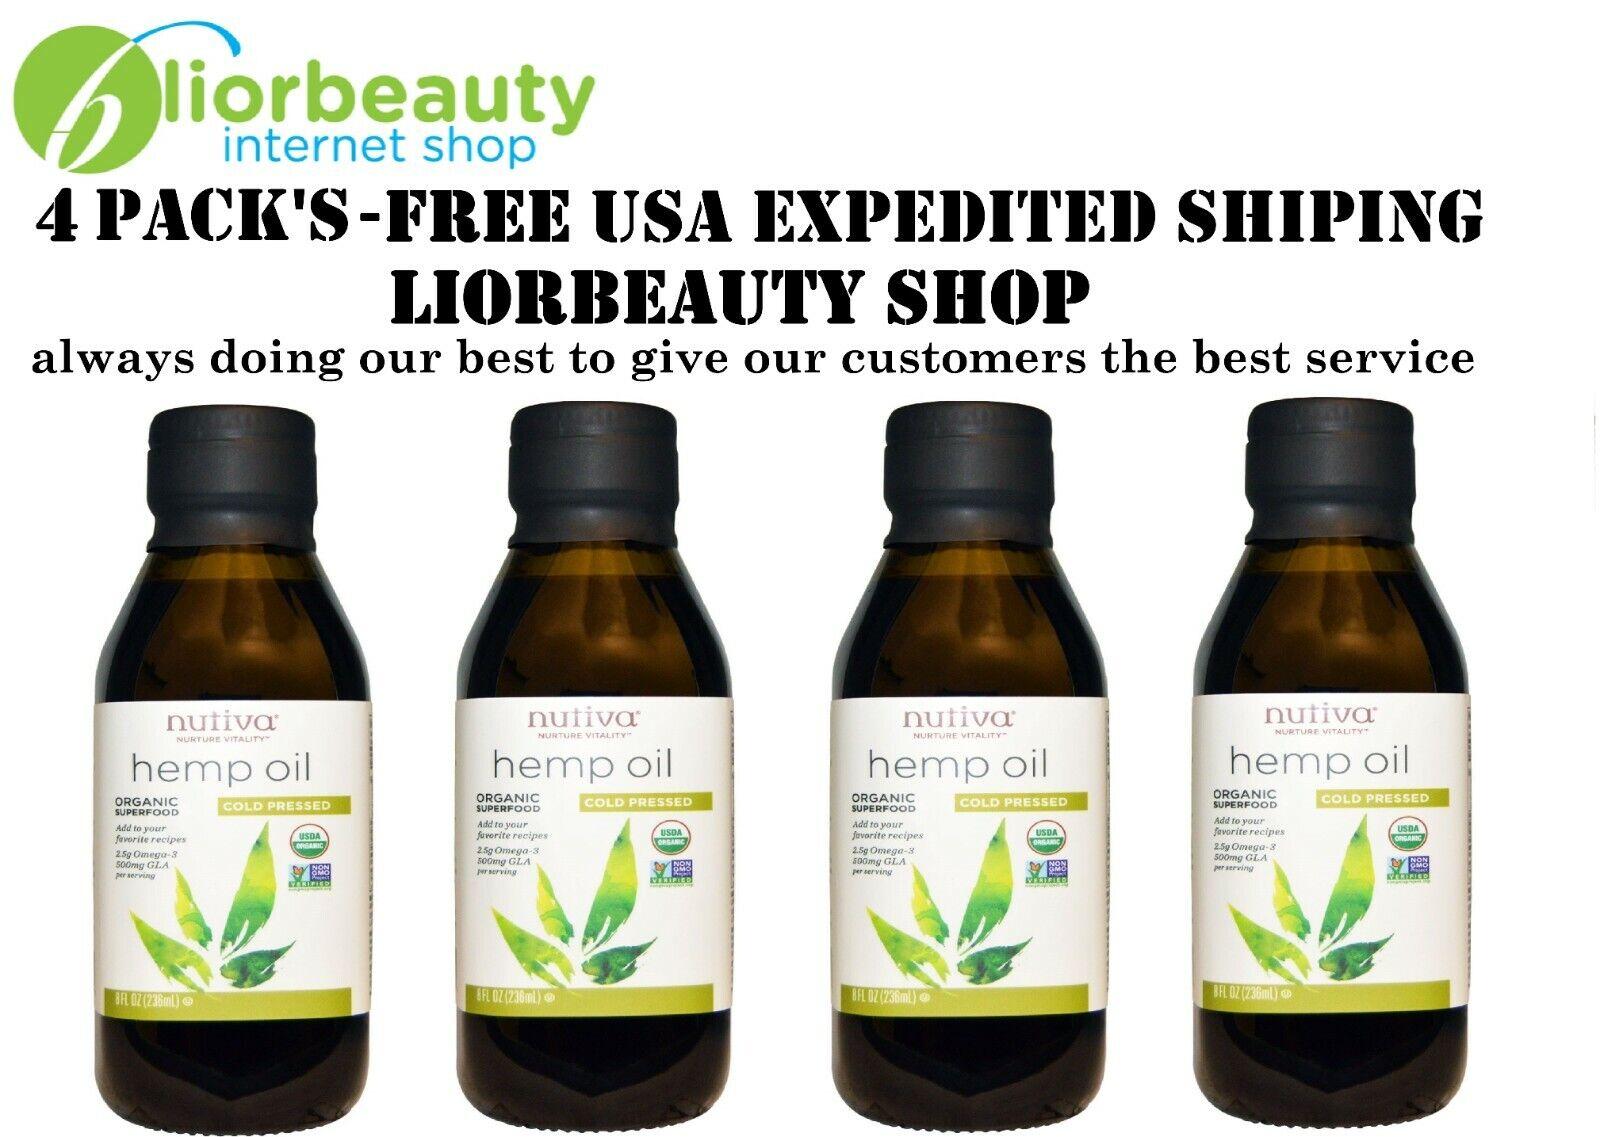 4 PACK'S - Nutiva, Organic, Hemp Oil, Cold Pressed, 8 fl oz (236 ml)